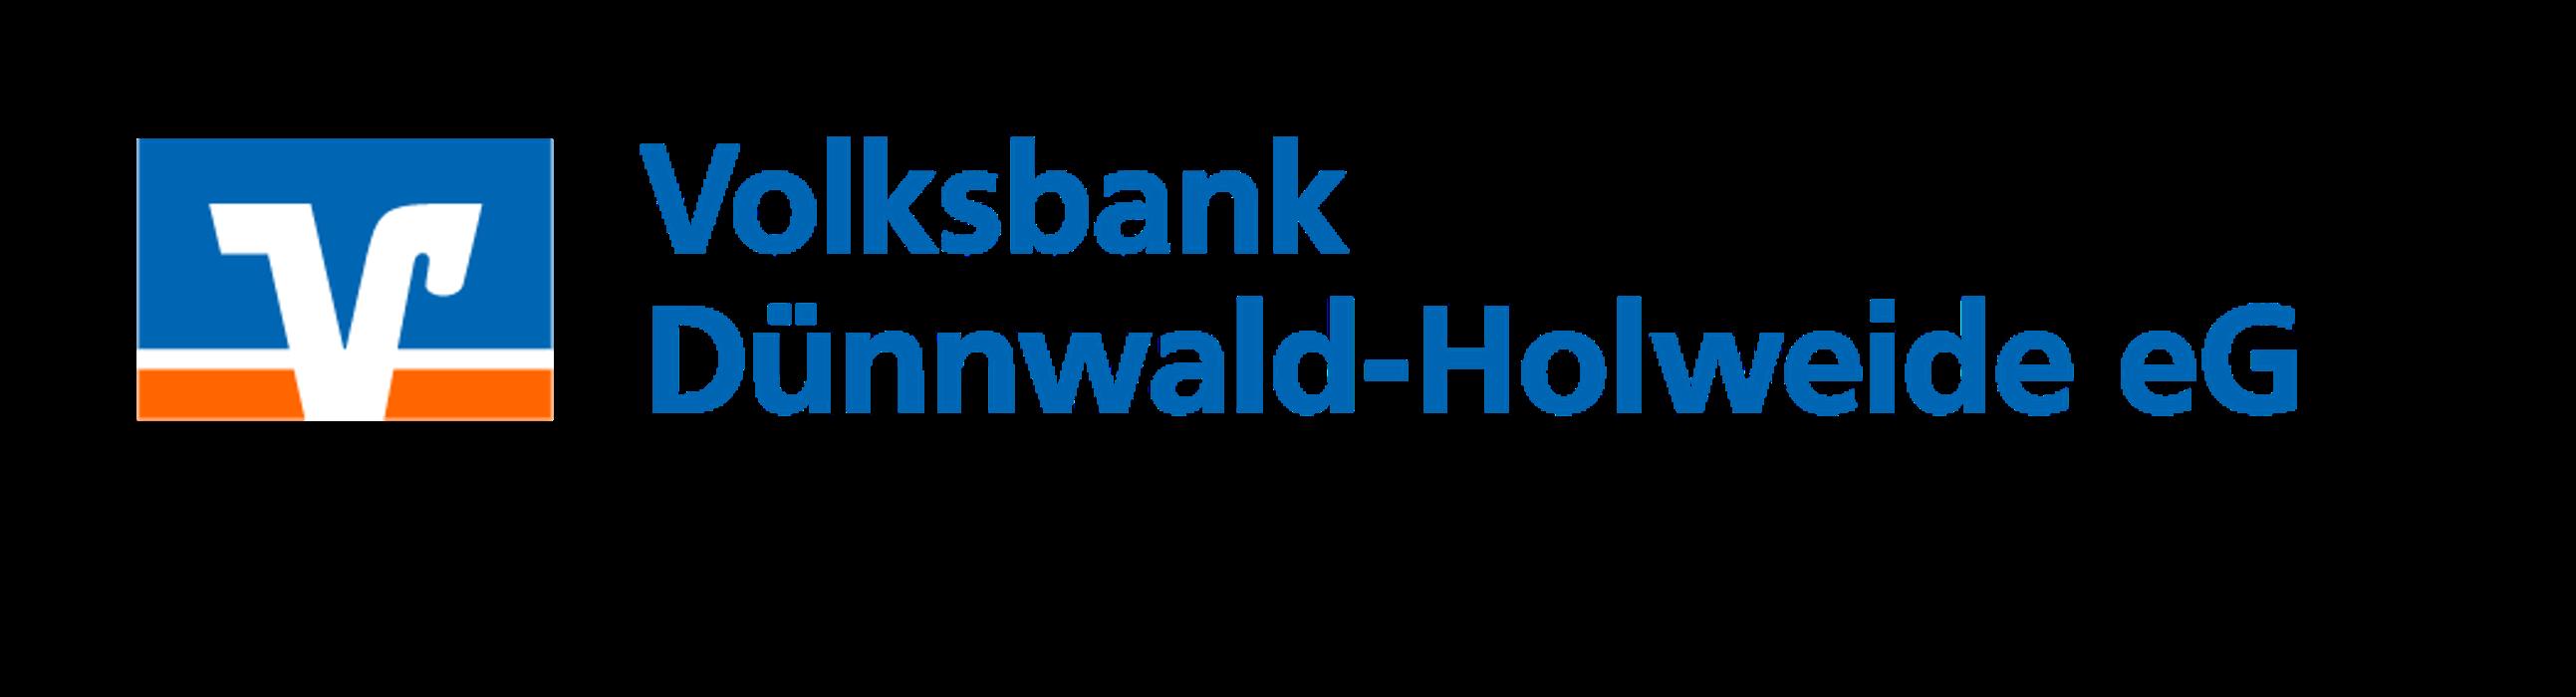 Volksbank Dünnwald-Holweide eG, Filiale Holweide